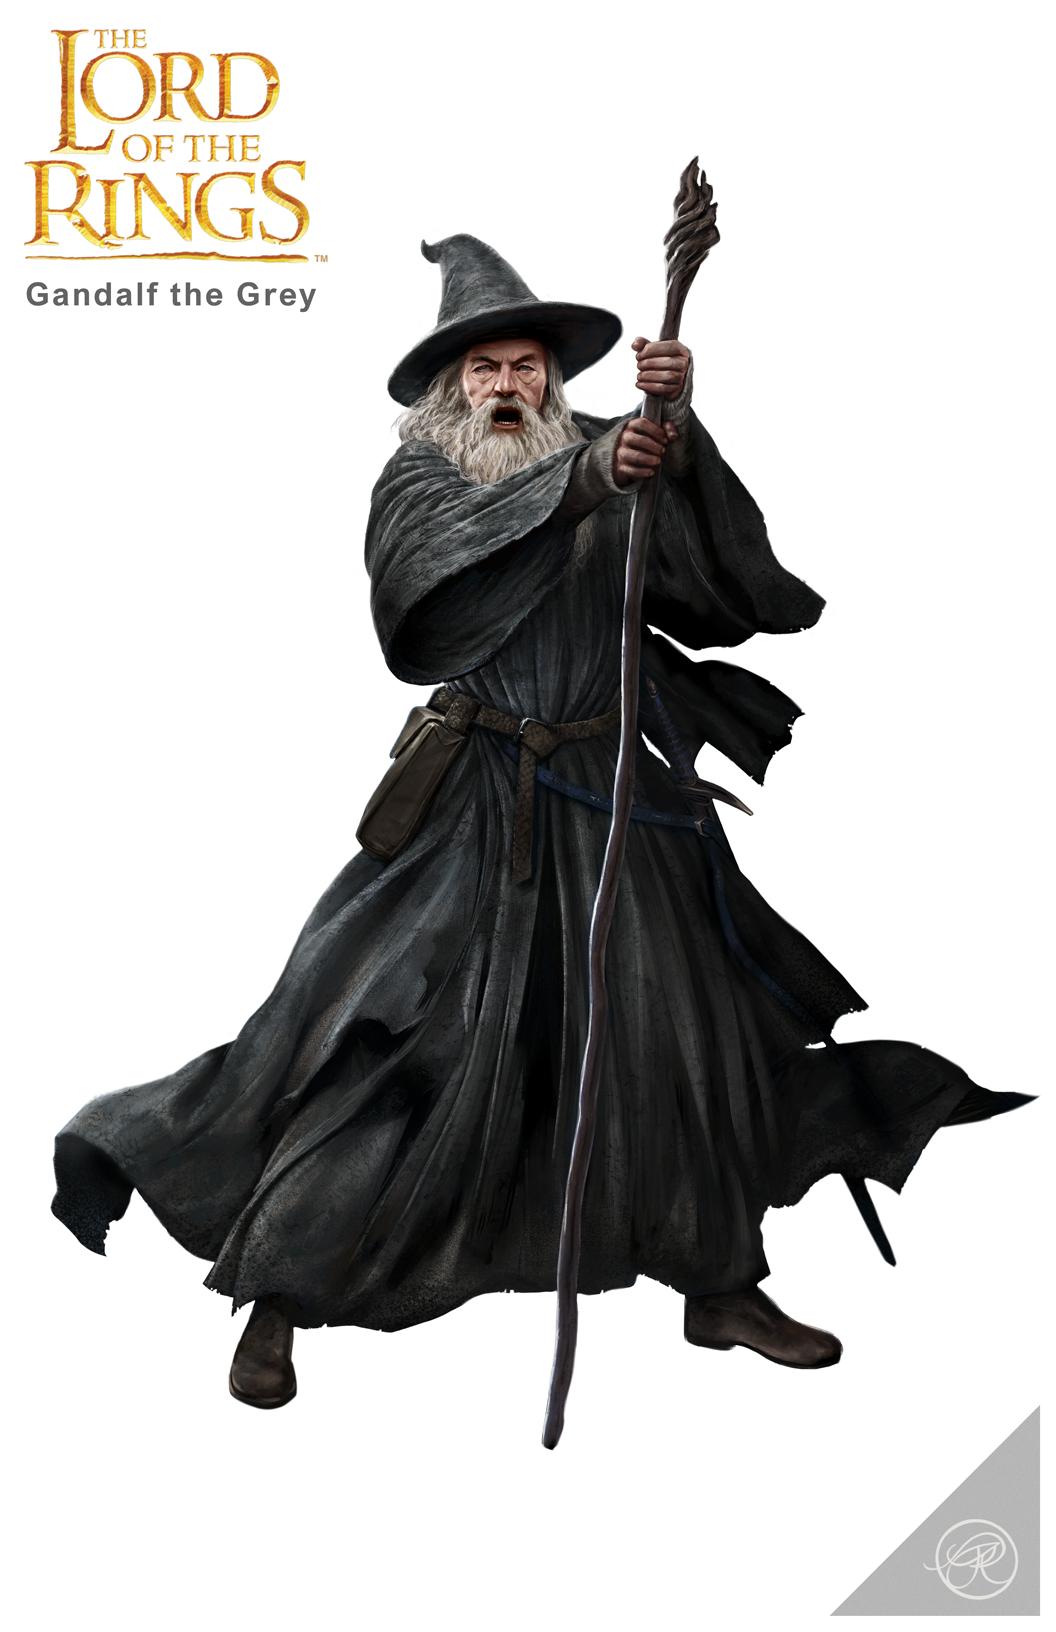 Ryan_alexander_lee_Gandalf_LOTR.jpg